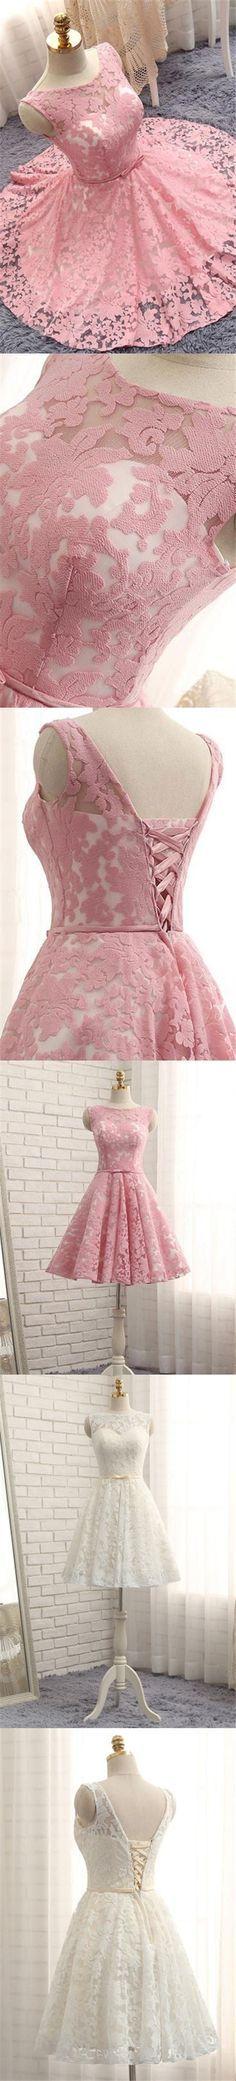 Lace Homecoming Dress Bateau Lace-up Bowknot Short Prom Dress Party Dress JK309